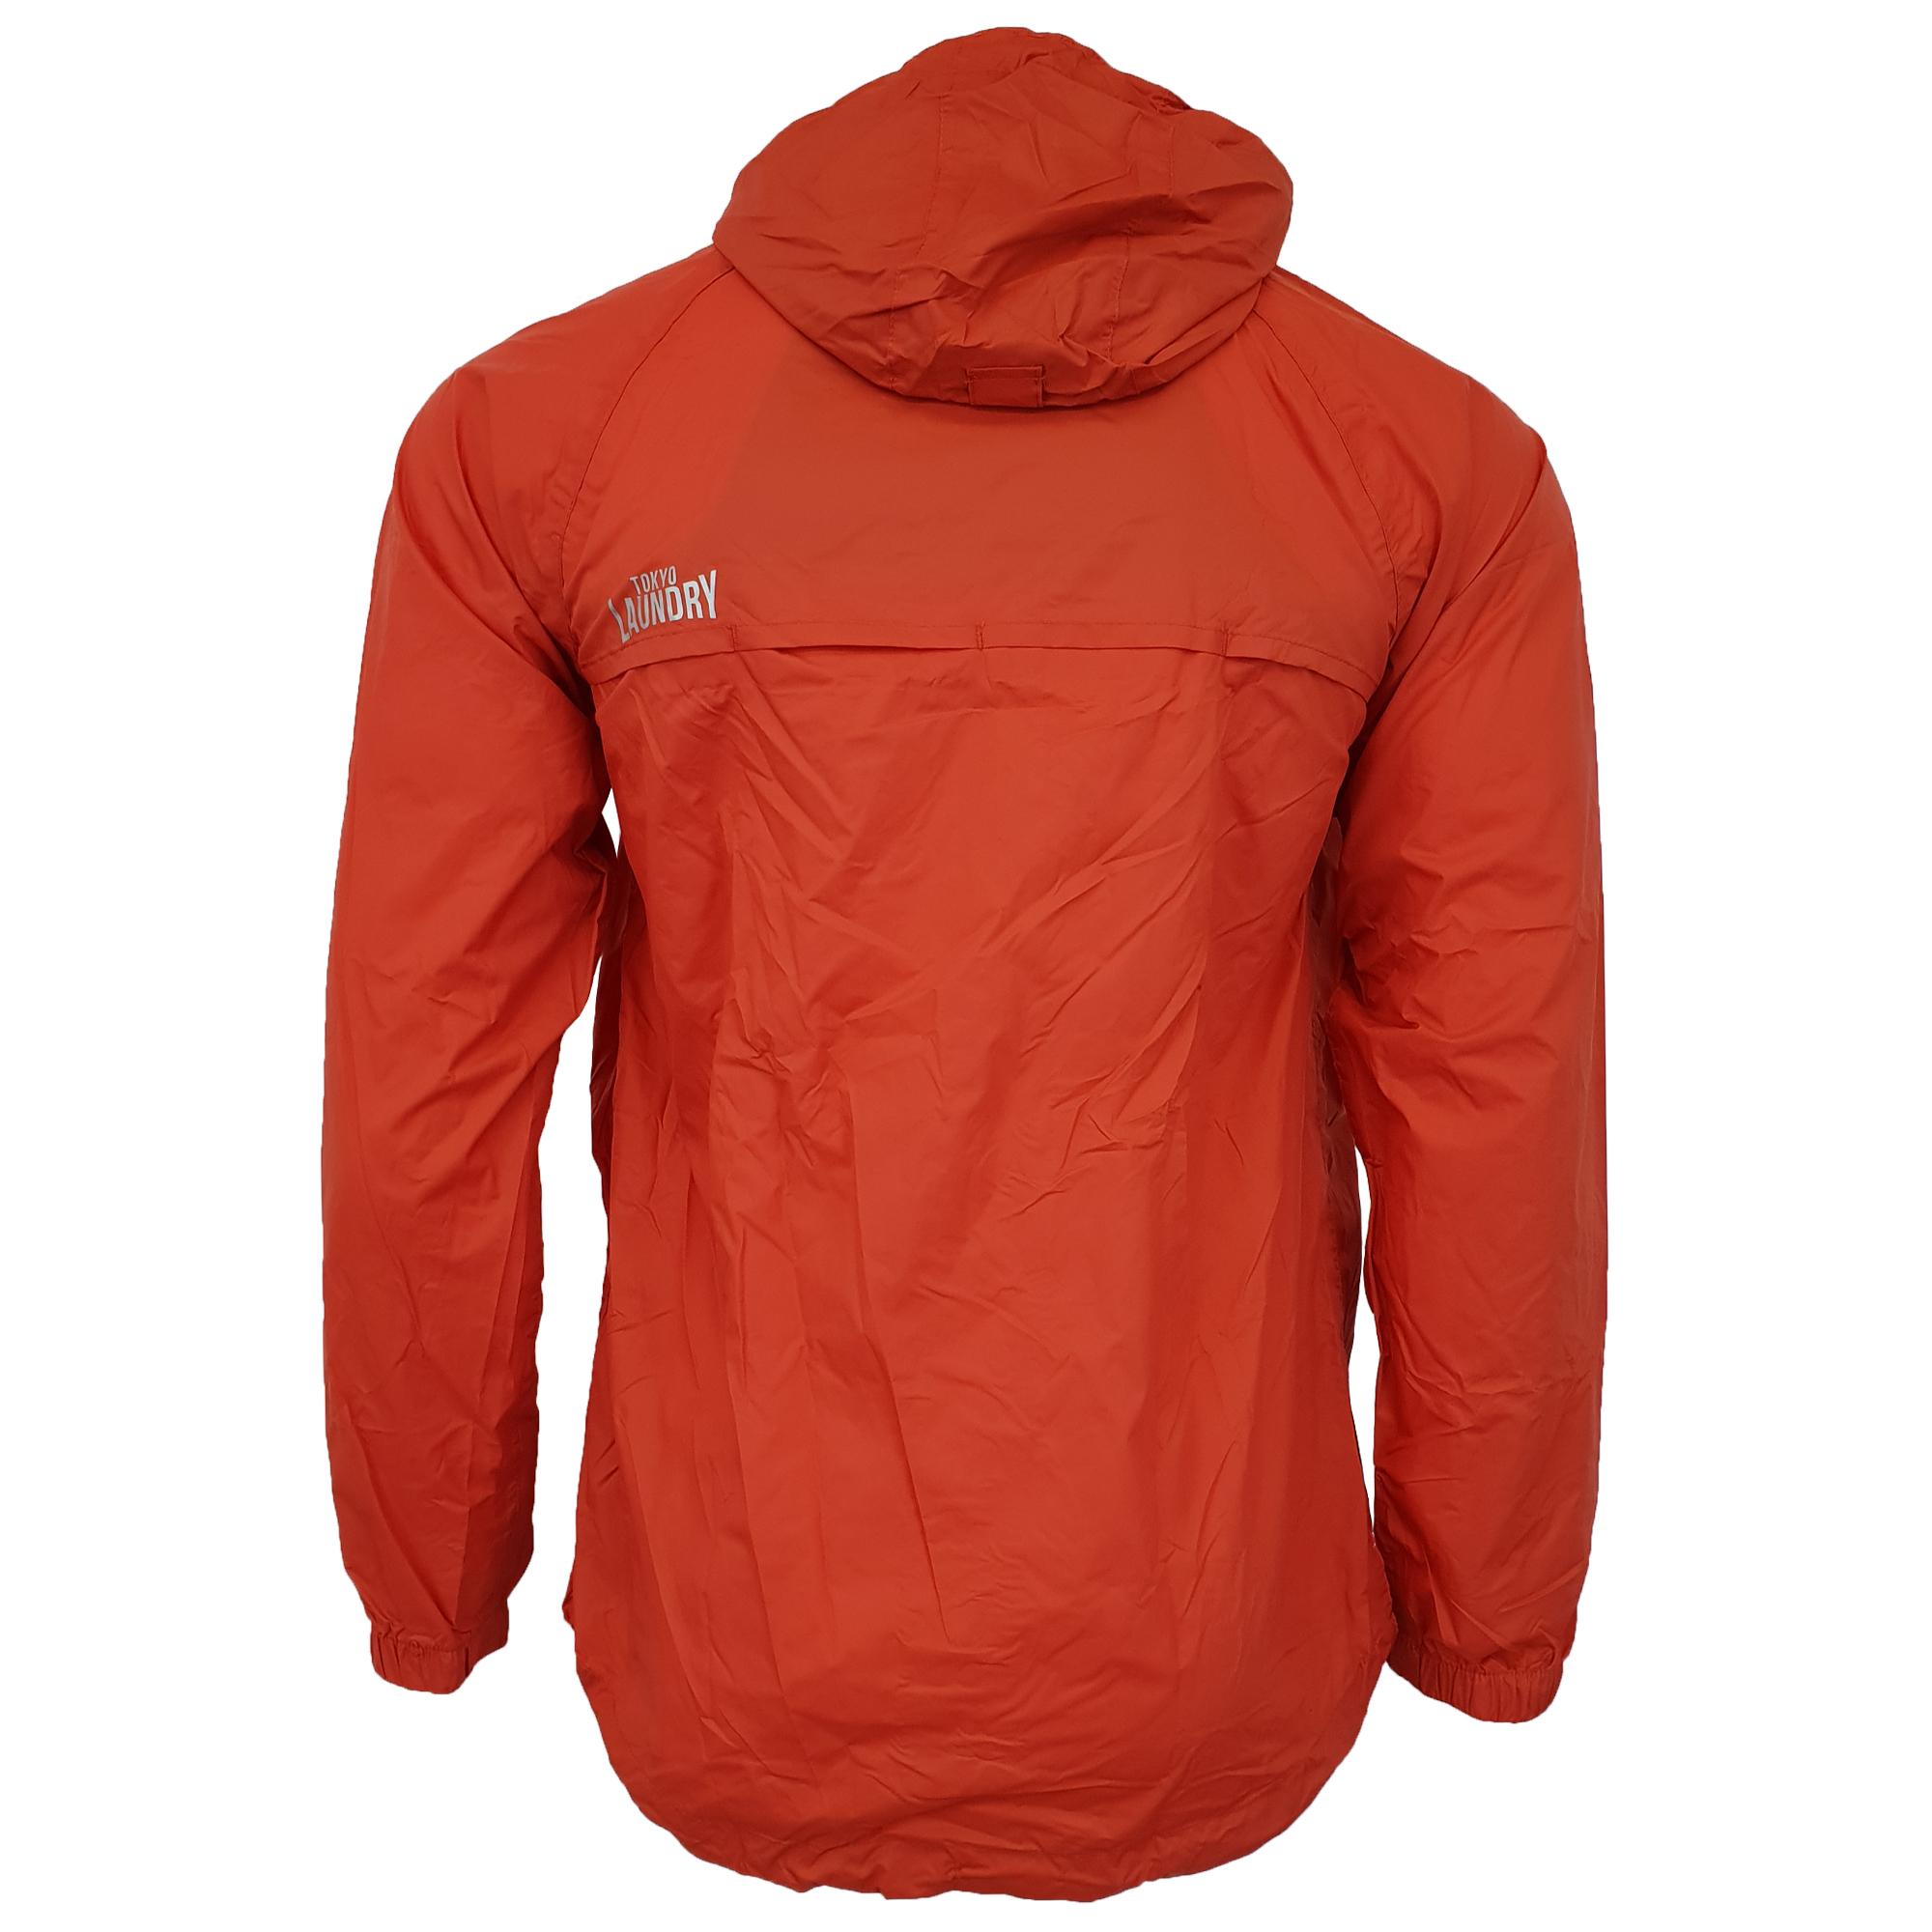 Mens-Kagool-Breathable-Hooded-Jacket-Tokyo-Laundry-Waterproof-Coat-Windproof-New thumbnail 12